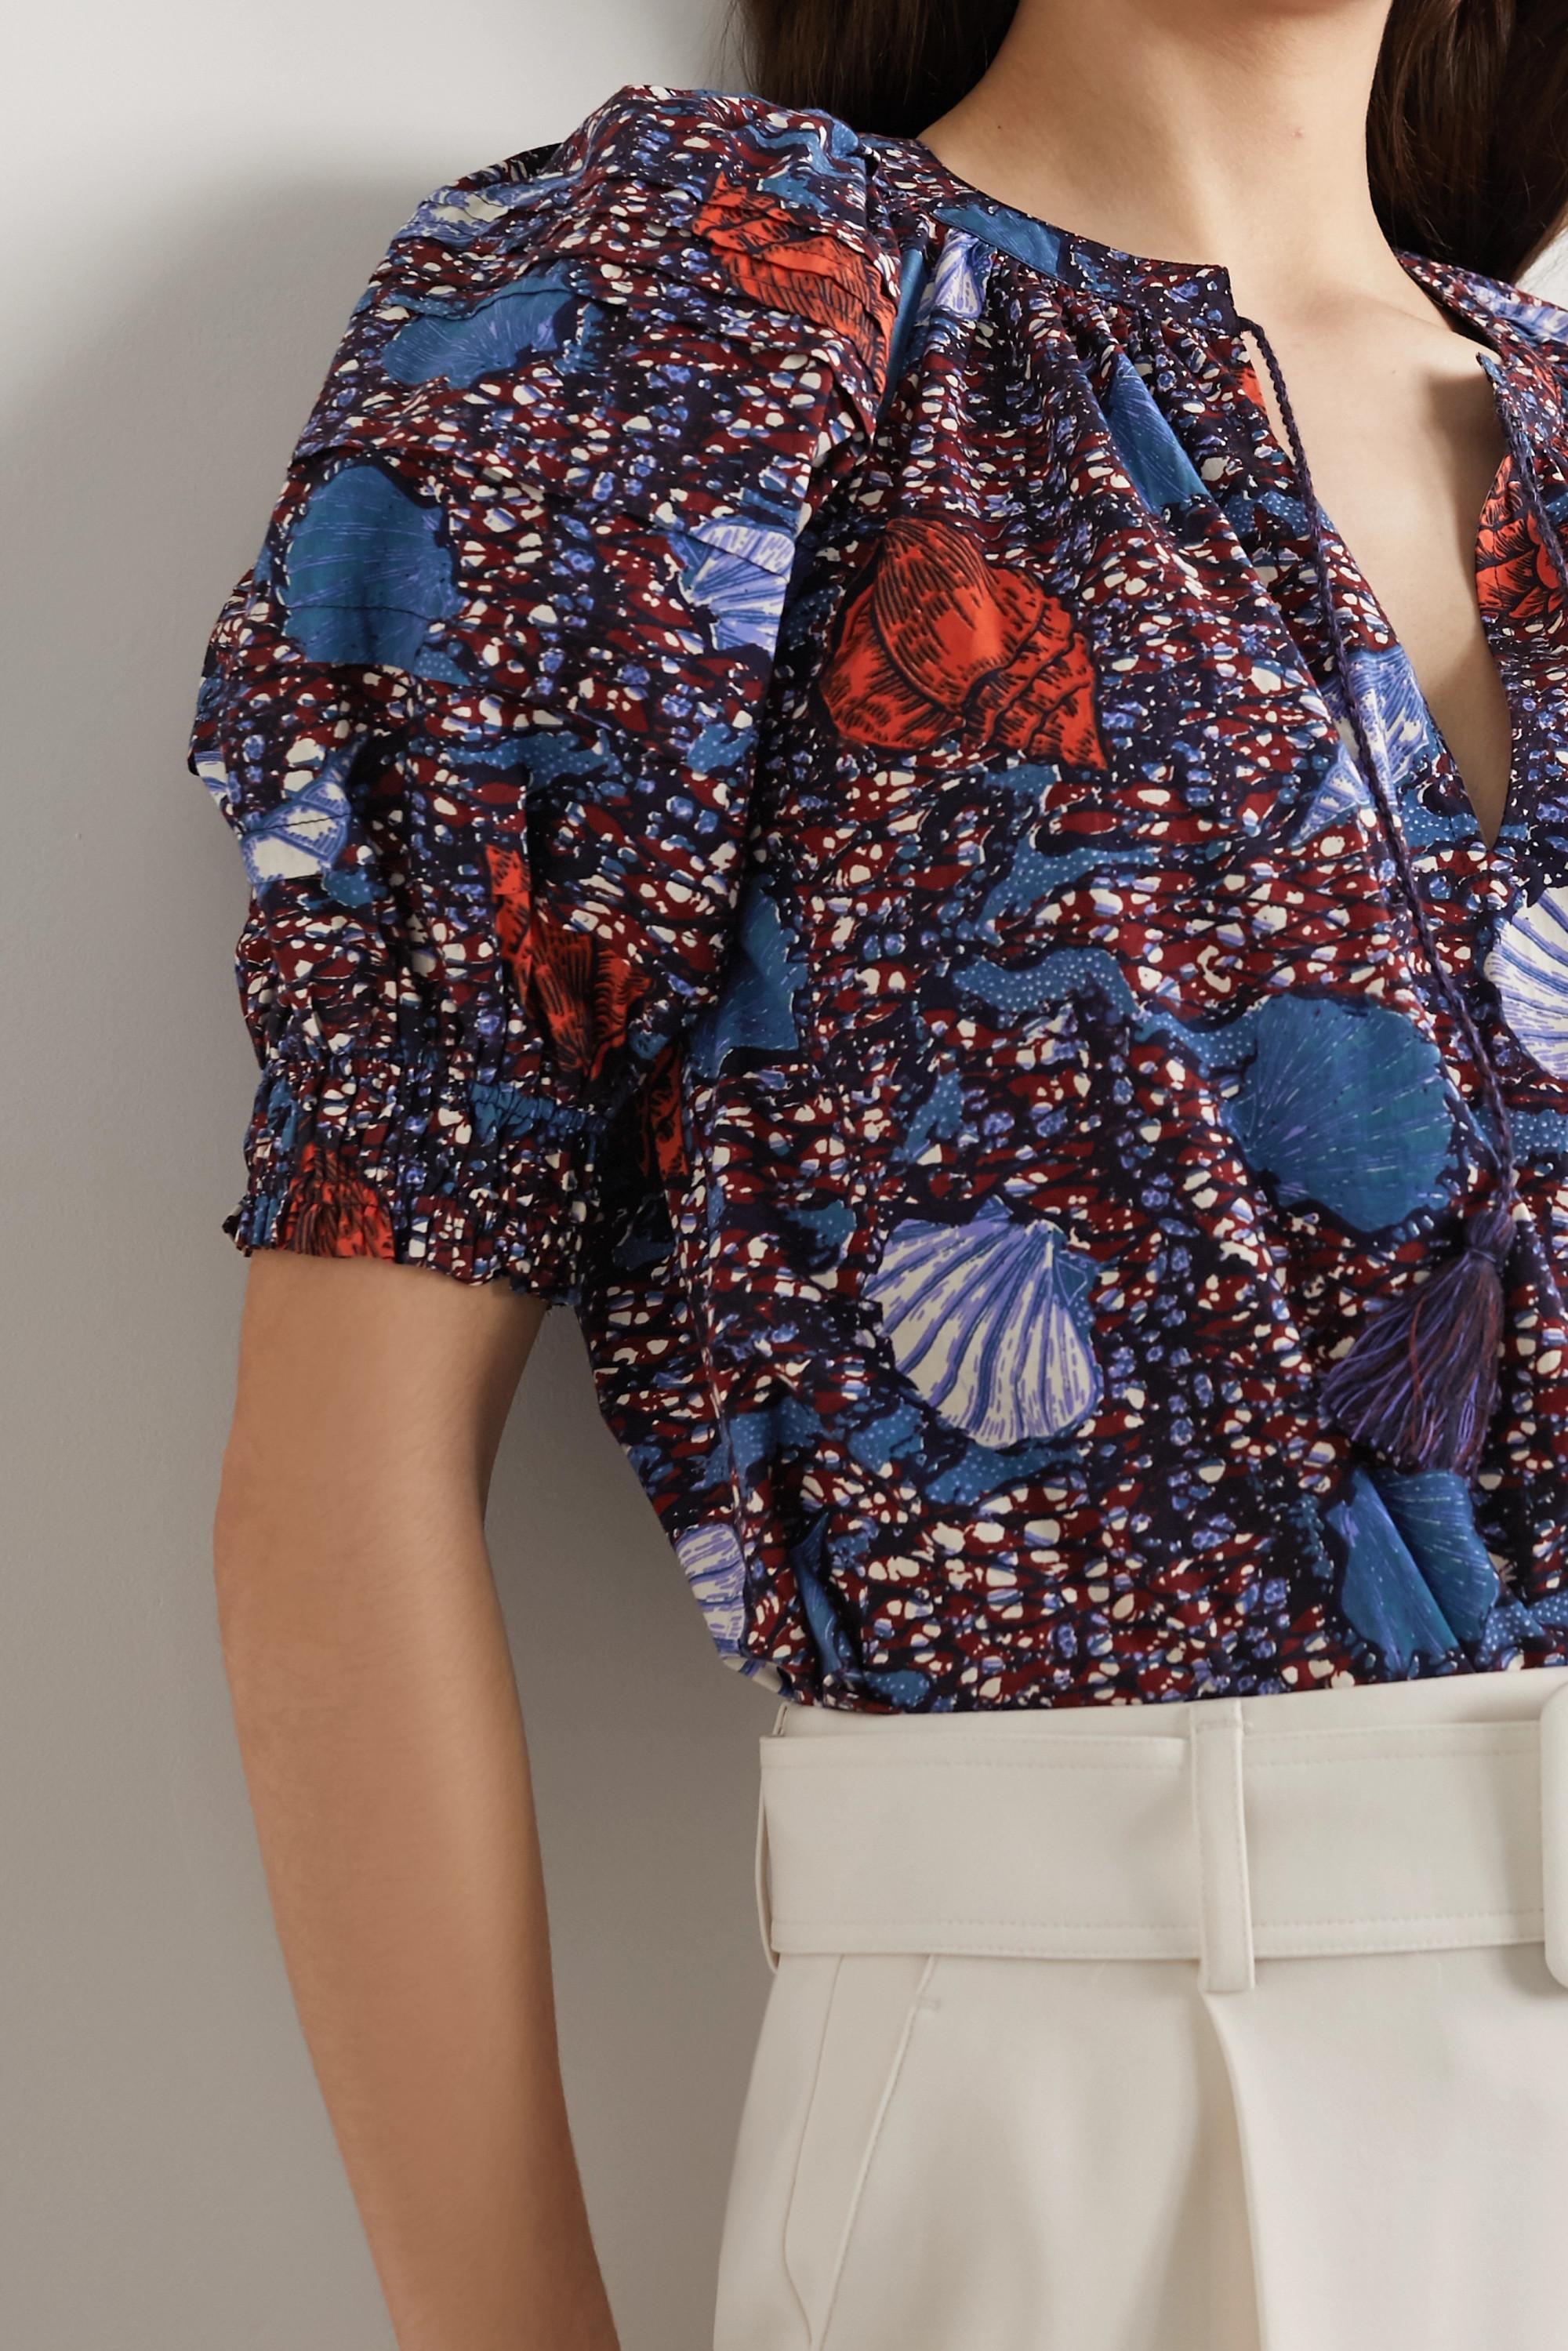 Ulla Johnson Arin tasseled printed cotton top